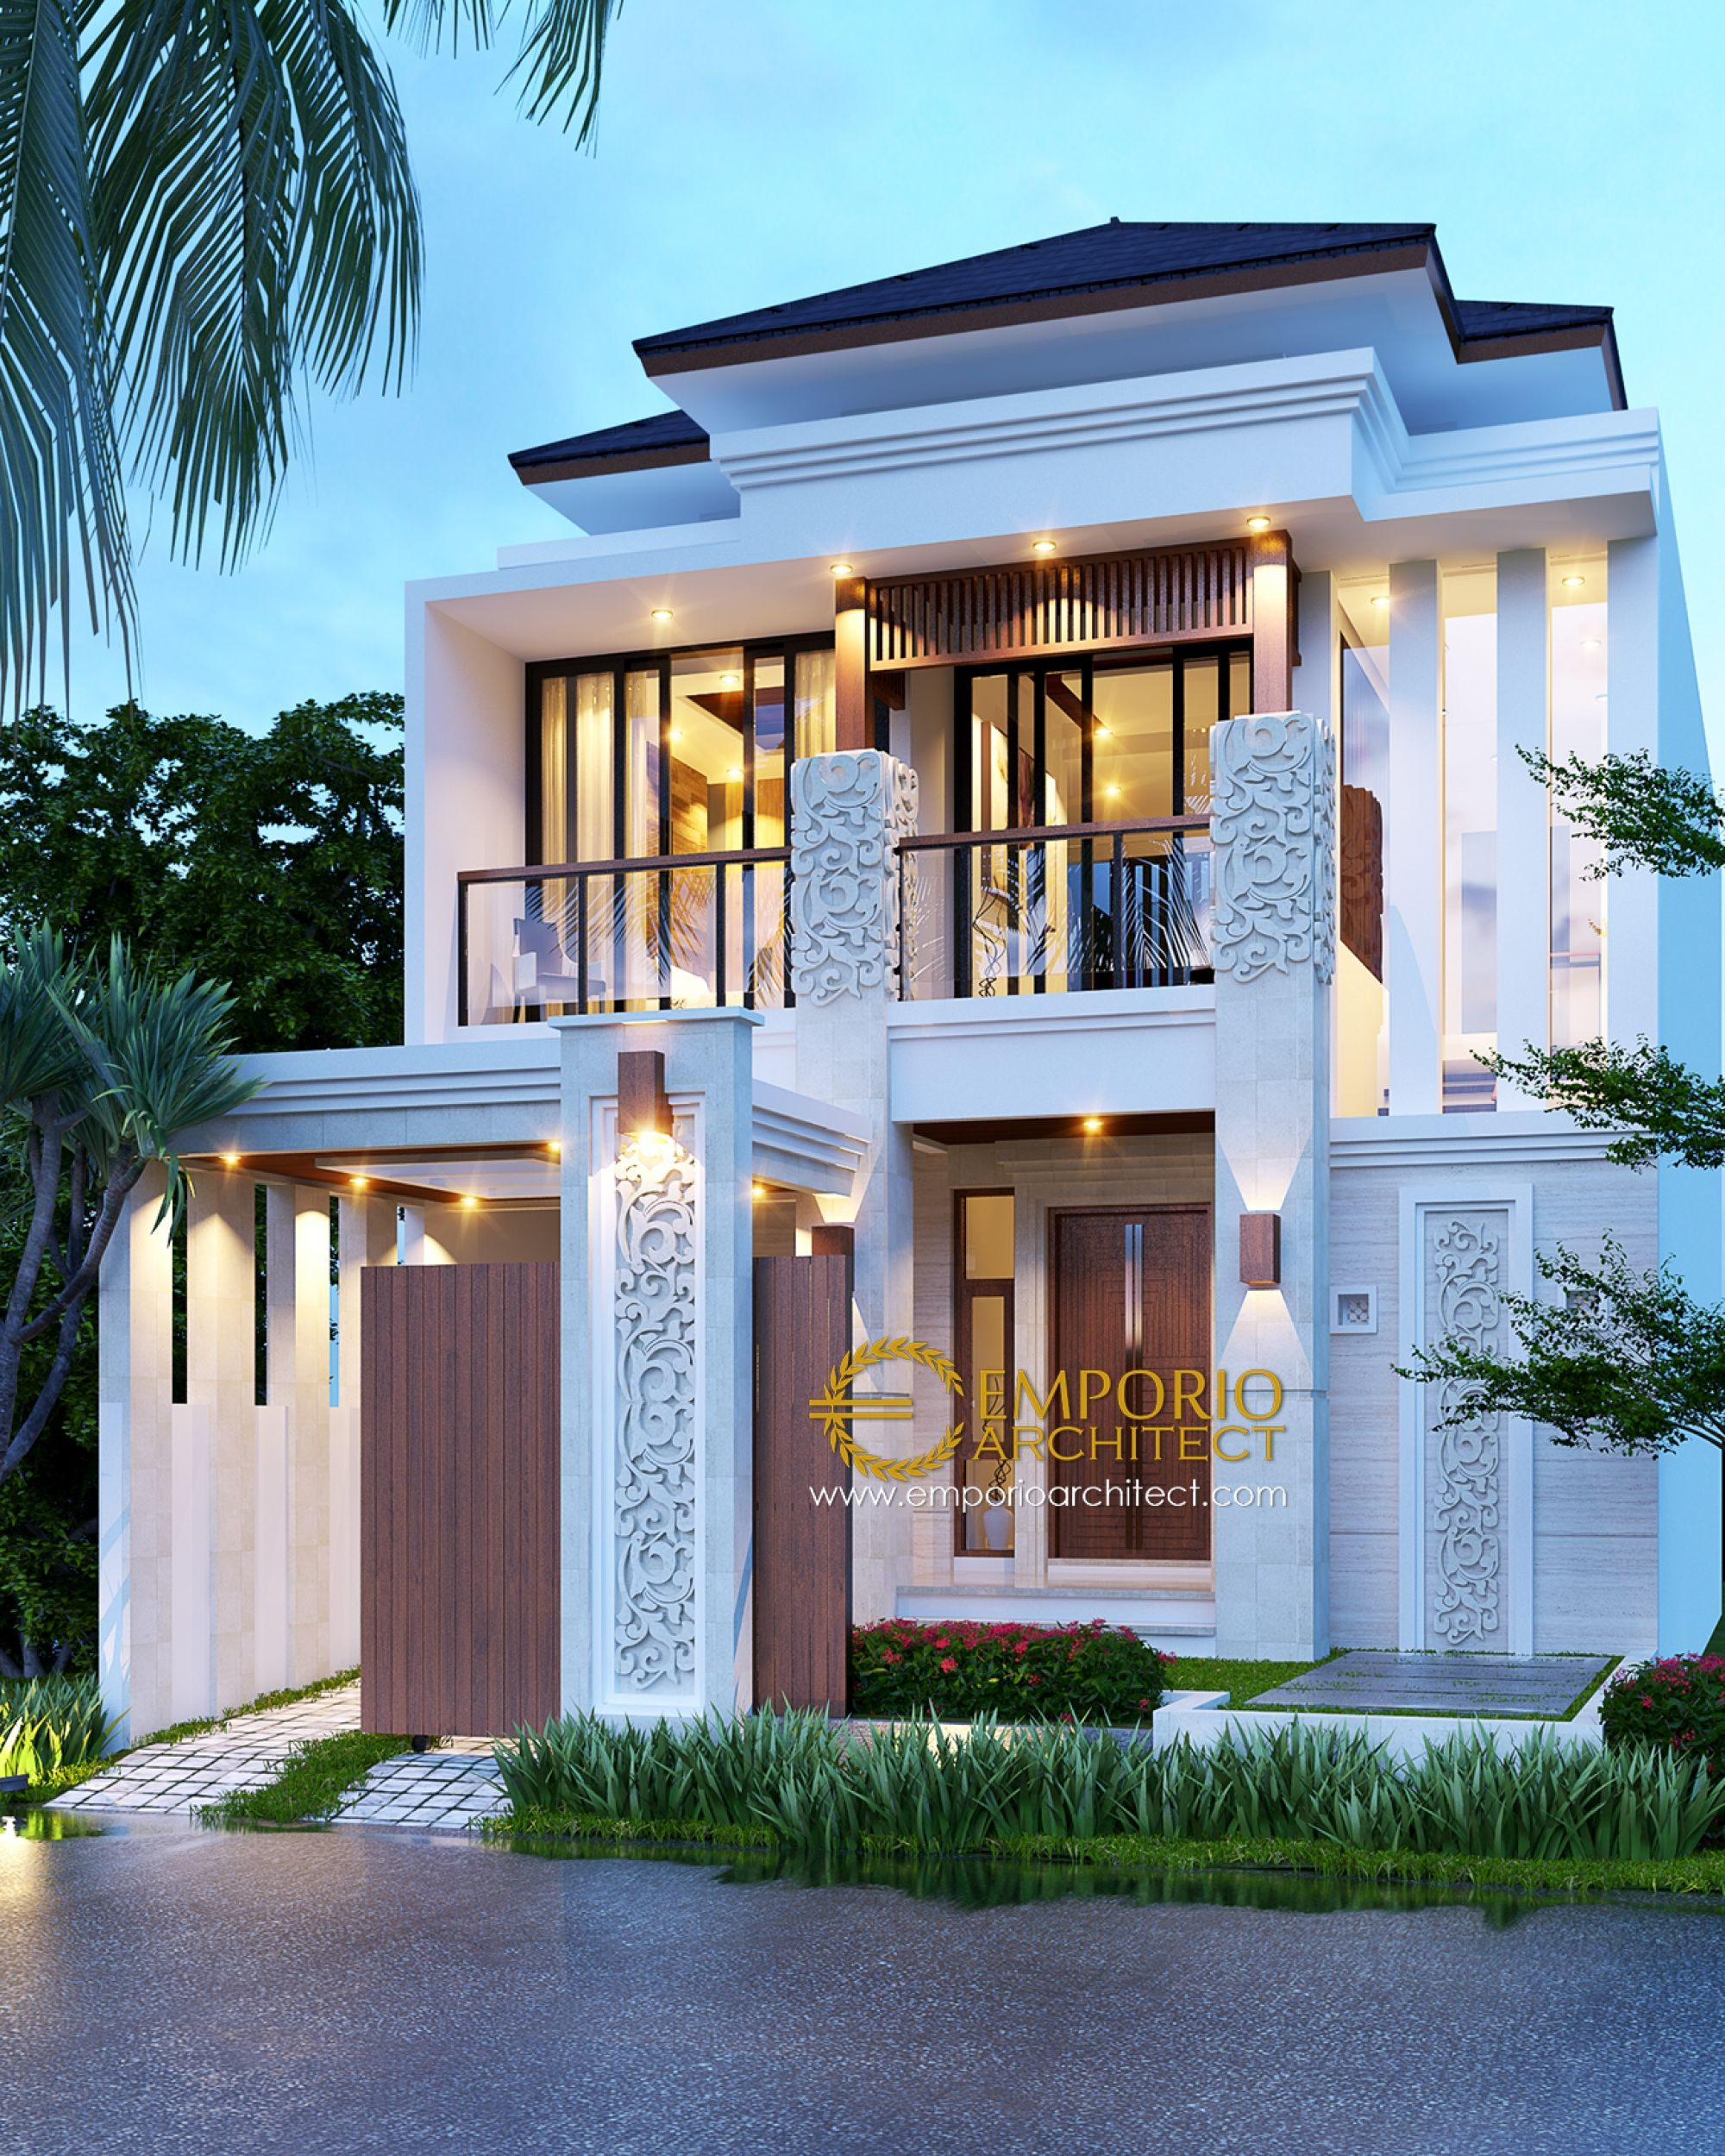 Jasa arsitek jakarta desain rumah bapak riyanto berkualitas villa bali modern house designmodern also with  superior business you will always discover an ideal remedy rh pinterest